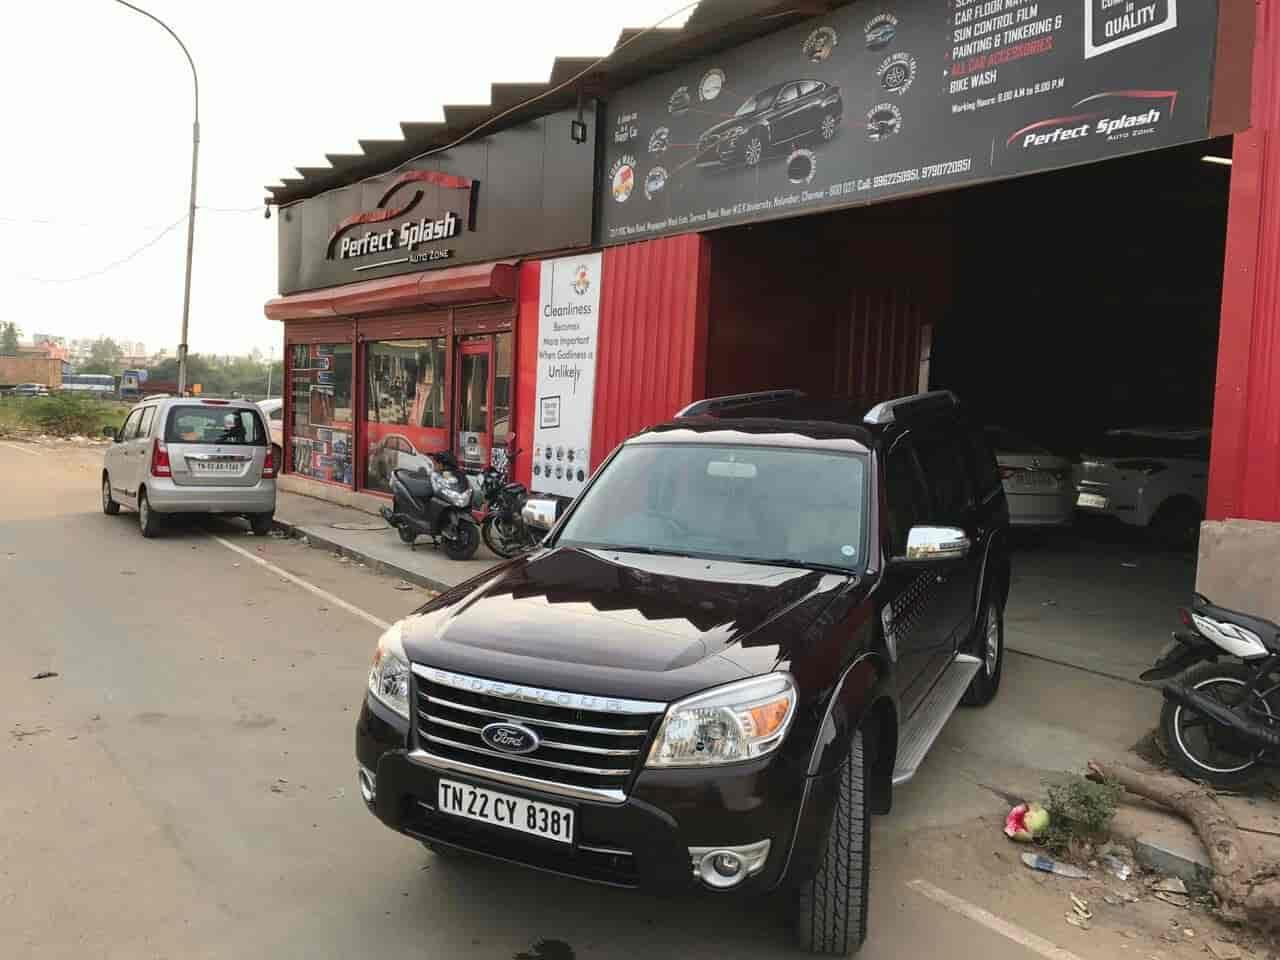 Perfect Splash Auto Zone, Nolambur - Car Polishing Services